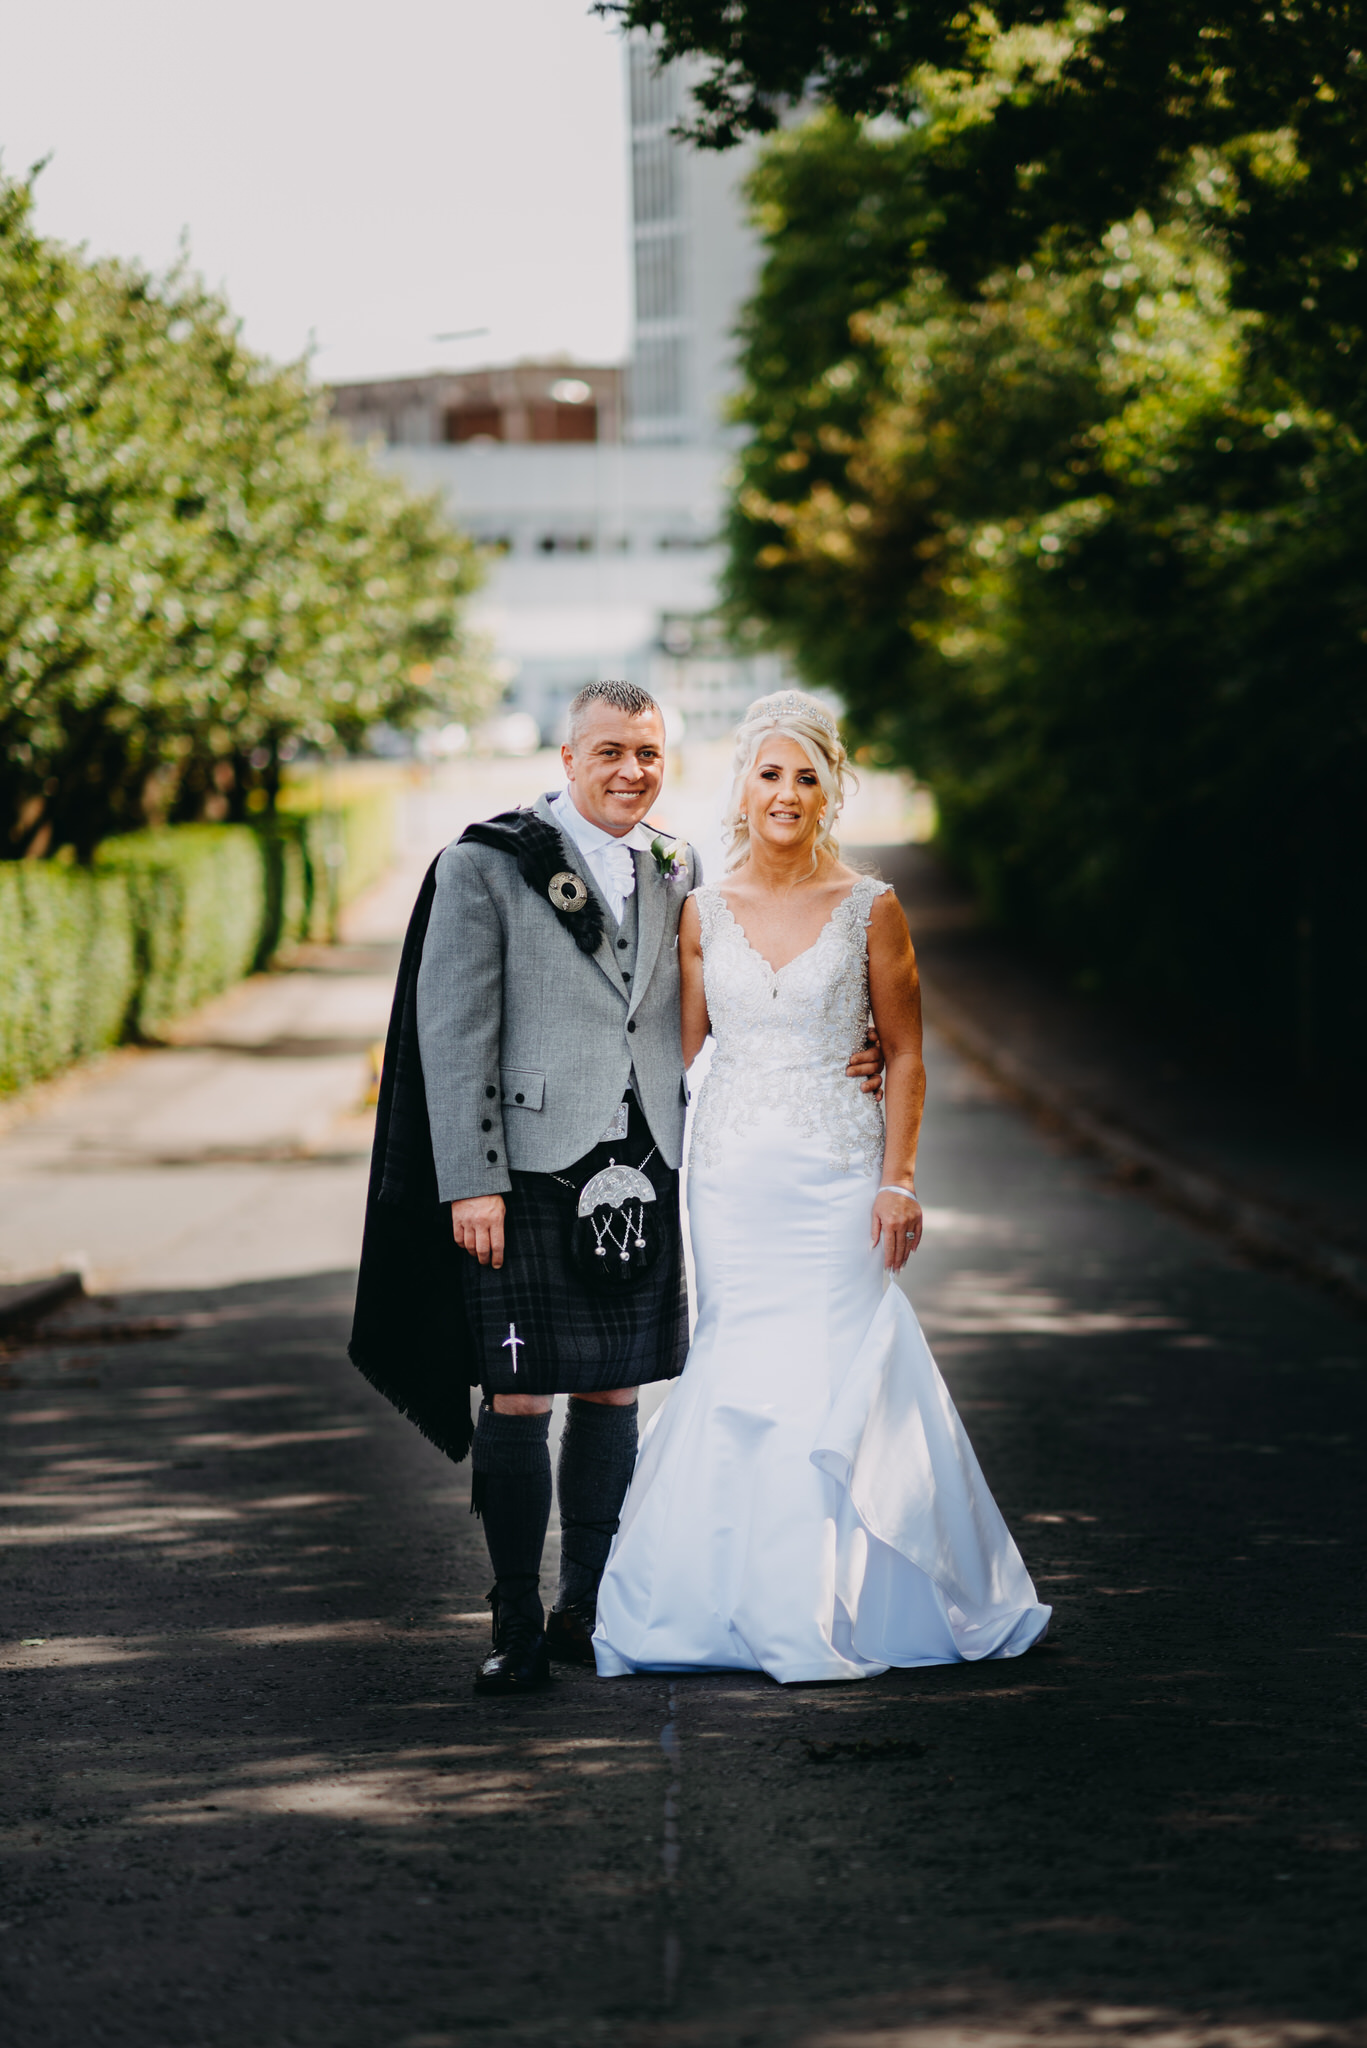 John & Sharon McBride - Garfield House Hotel_405 - Copy.jpg